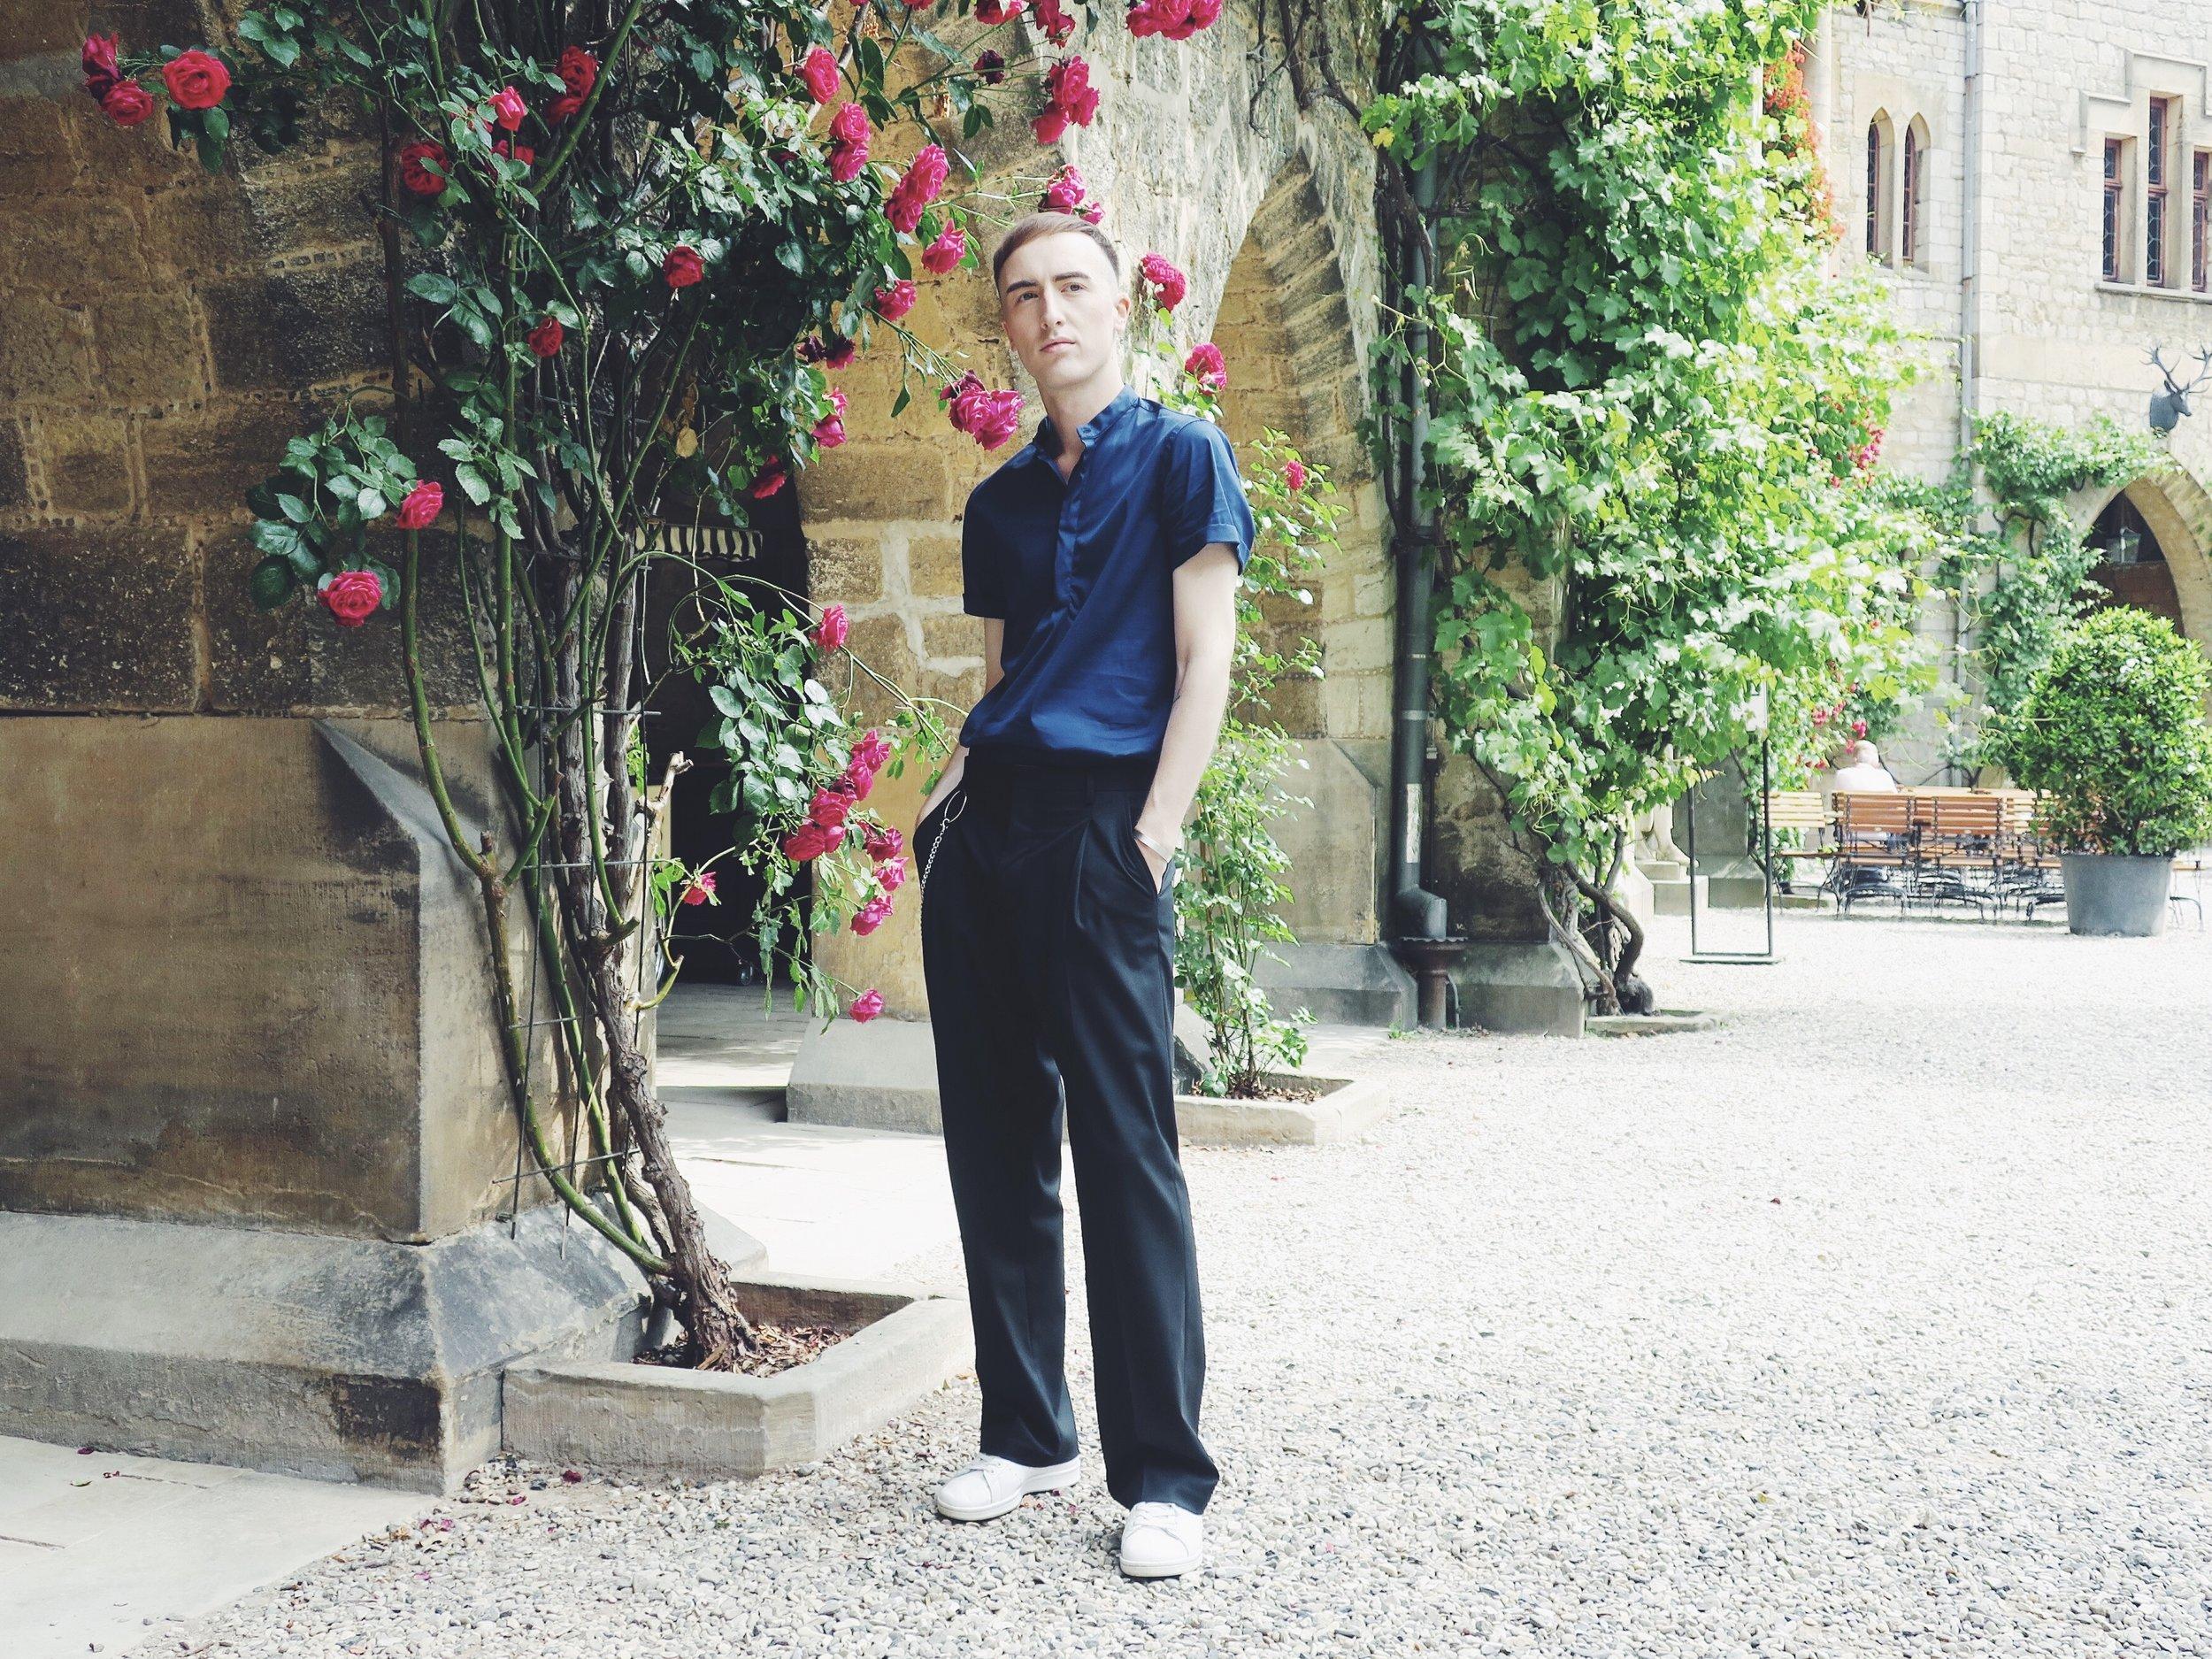 Zara shirt - Zara trousers - Adidas Stan Smith sneakers